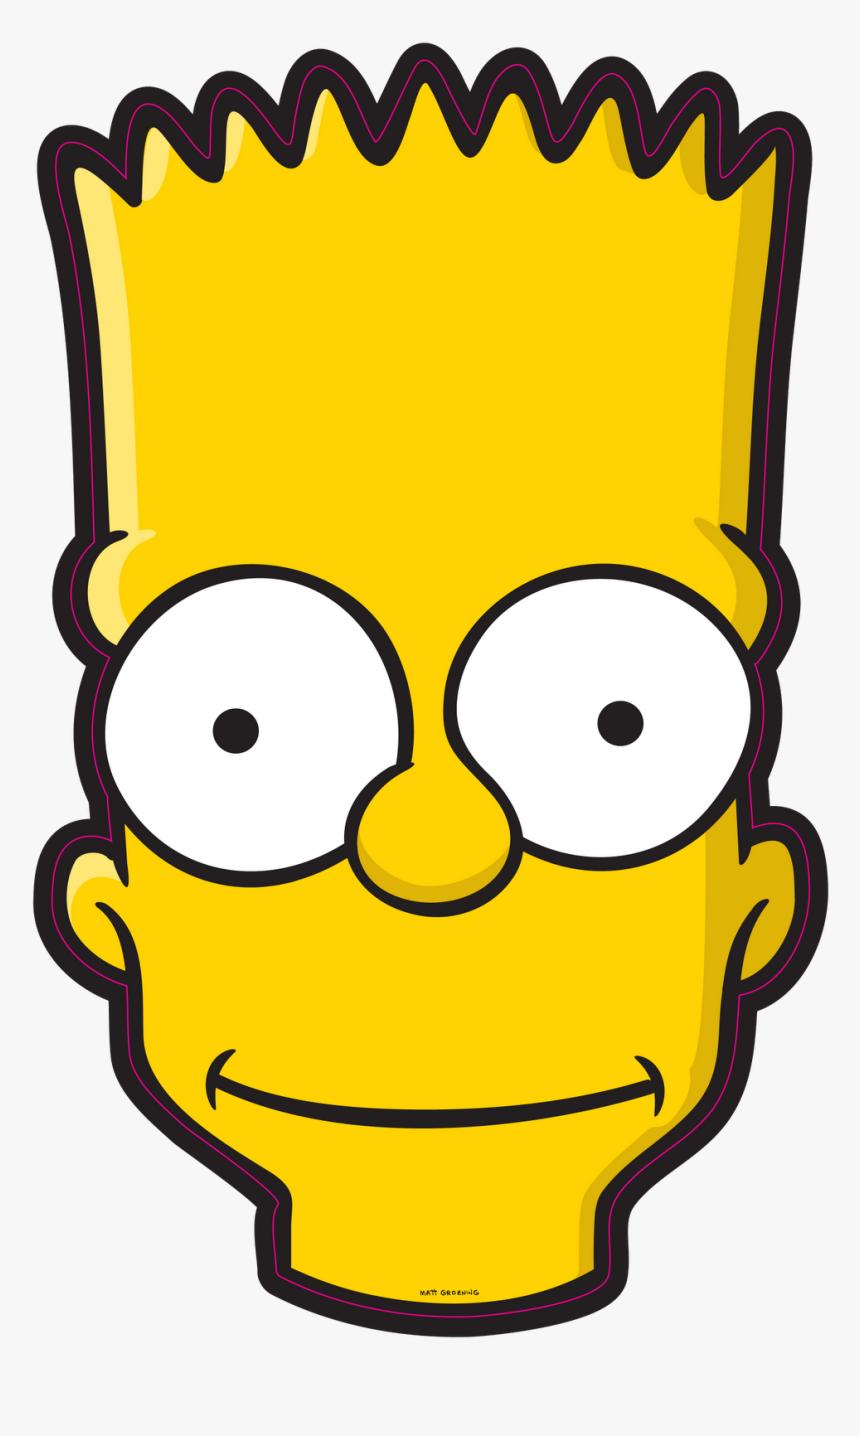 Bart Simpson Homer Simpson Maggie Simpson Marge Simpson